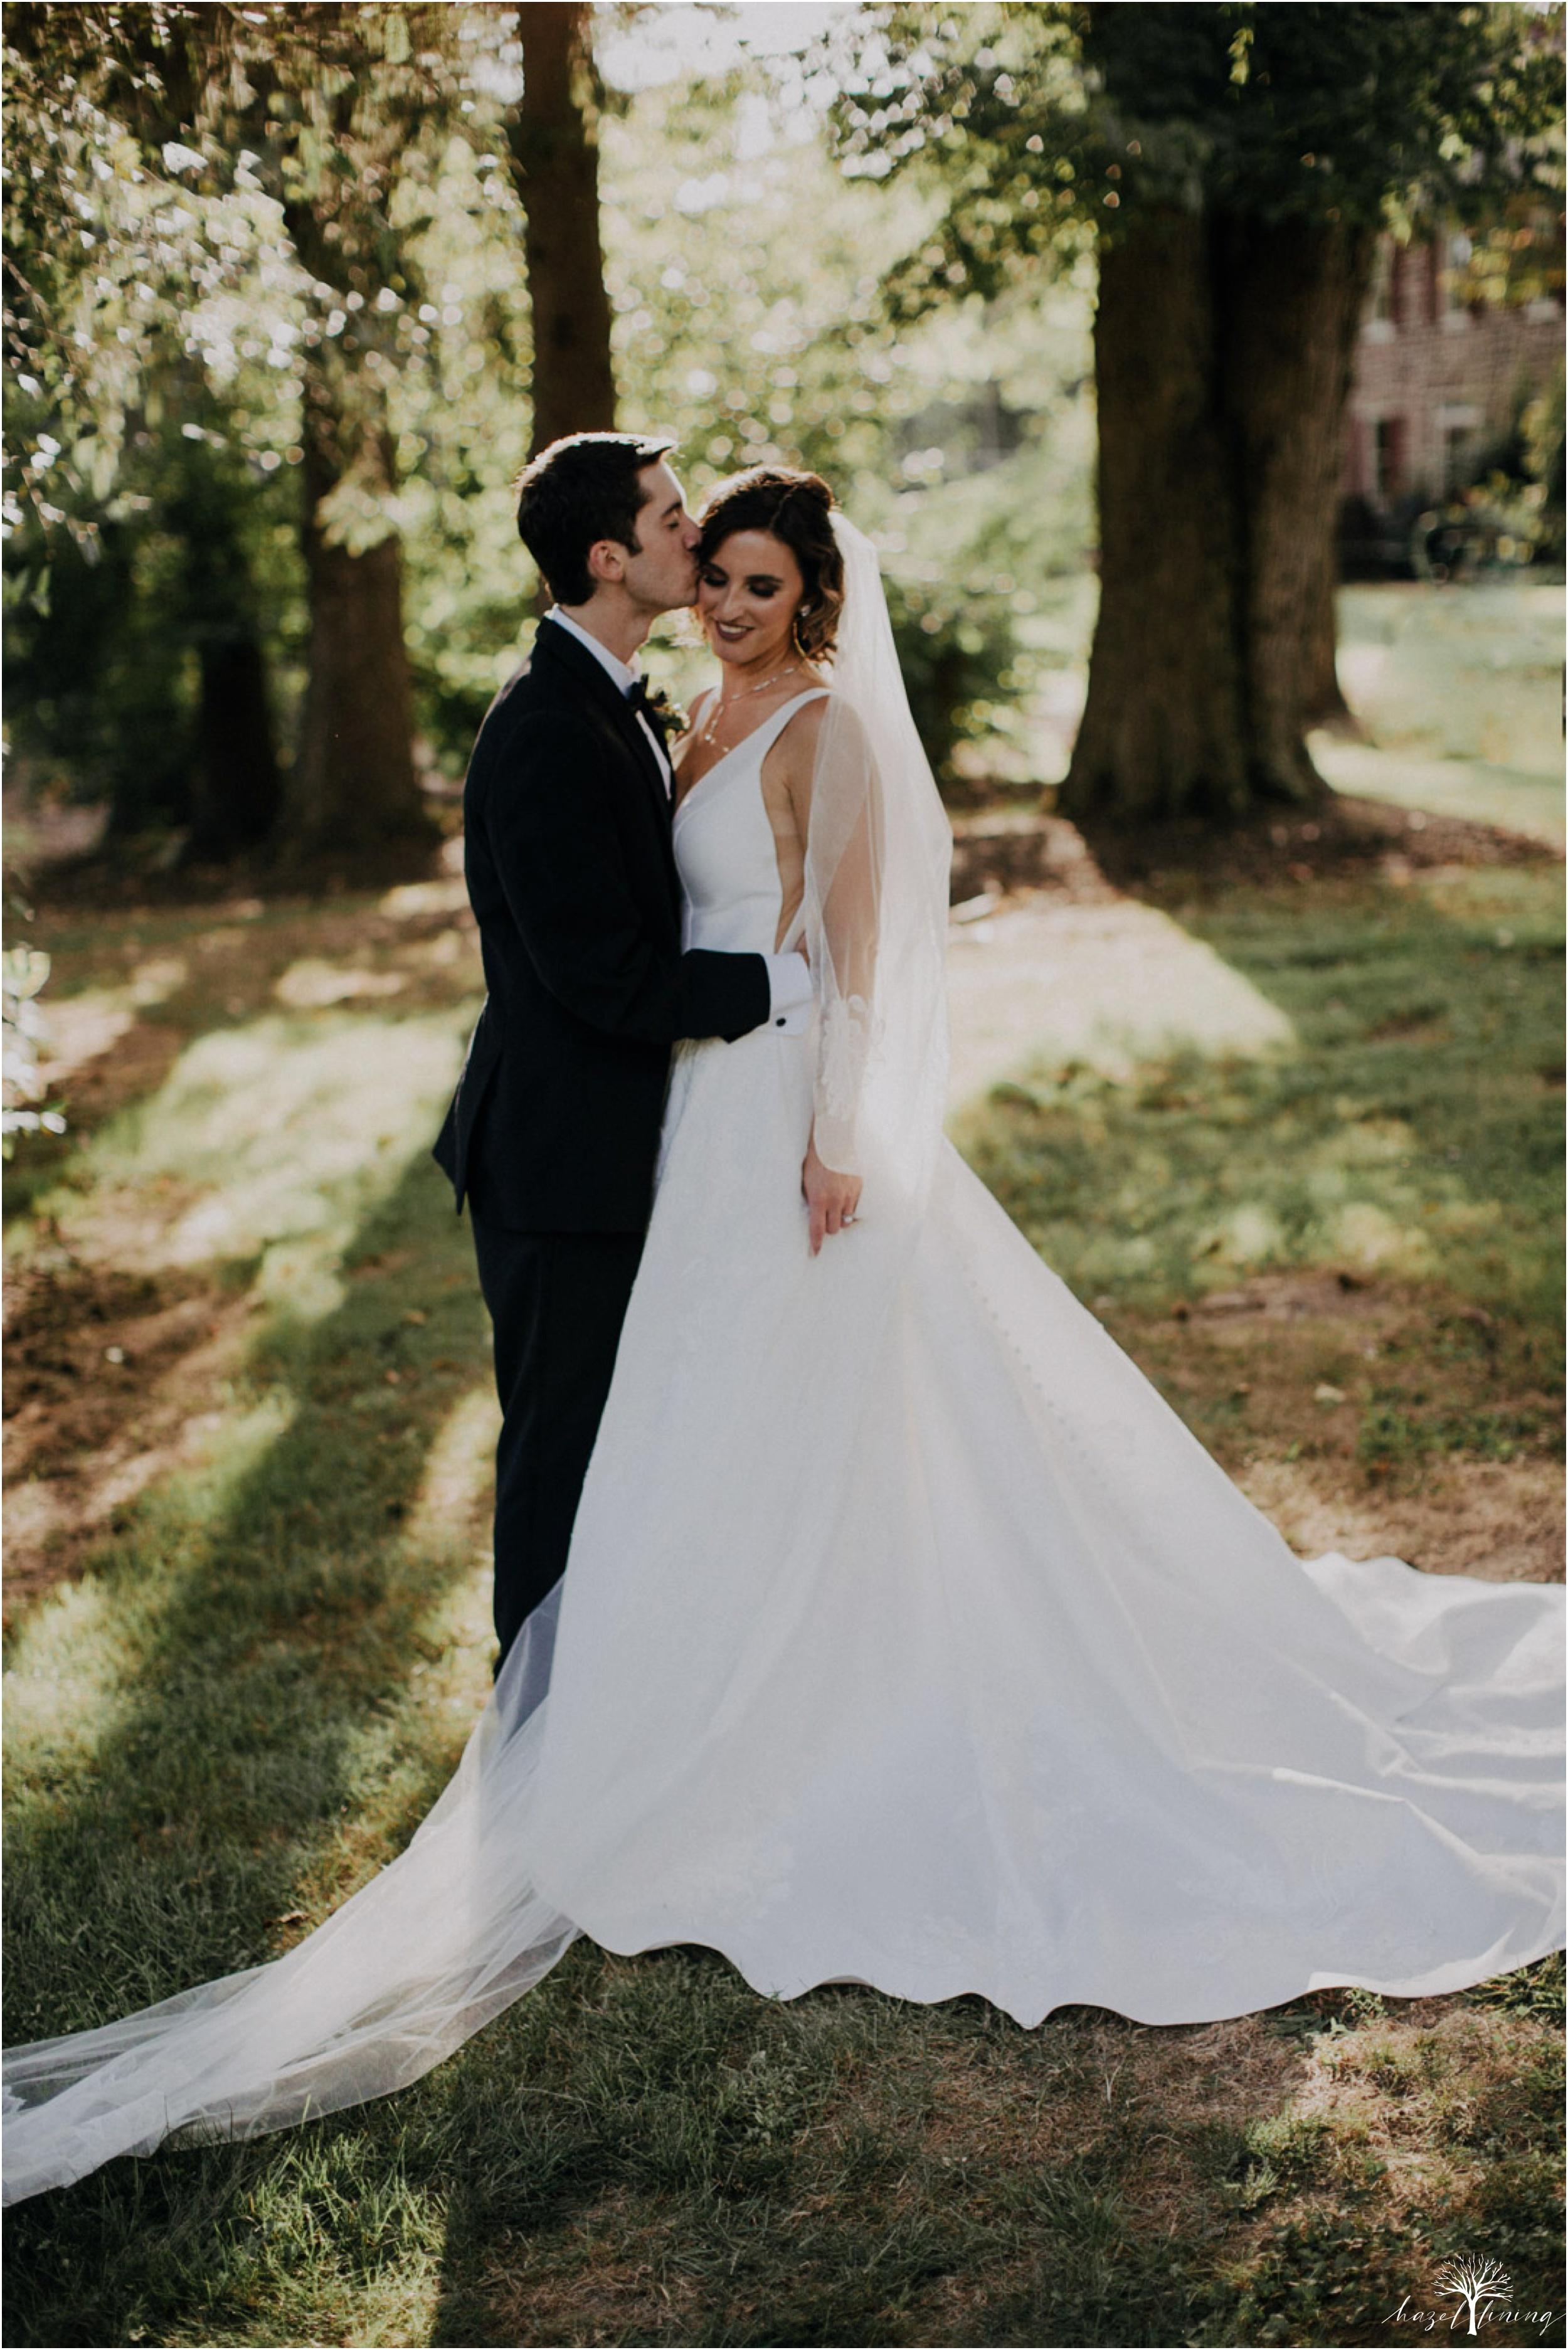 maureen-hepner-anthony-giordano-rose-bank-winery-newtow-pennsylvania-luxury-summer-wedding-hazel-lining-photography-destination-elopement-wedding-engagement-photography_0120.jpg